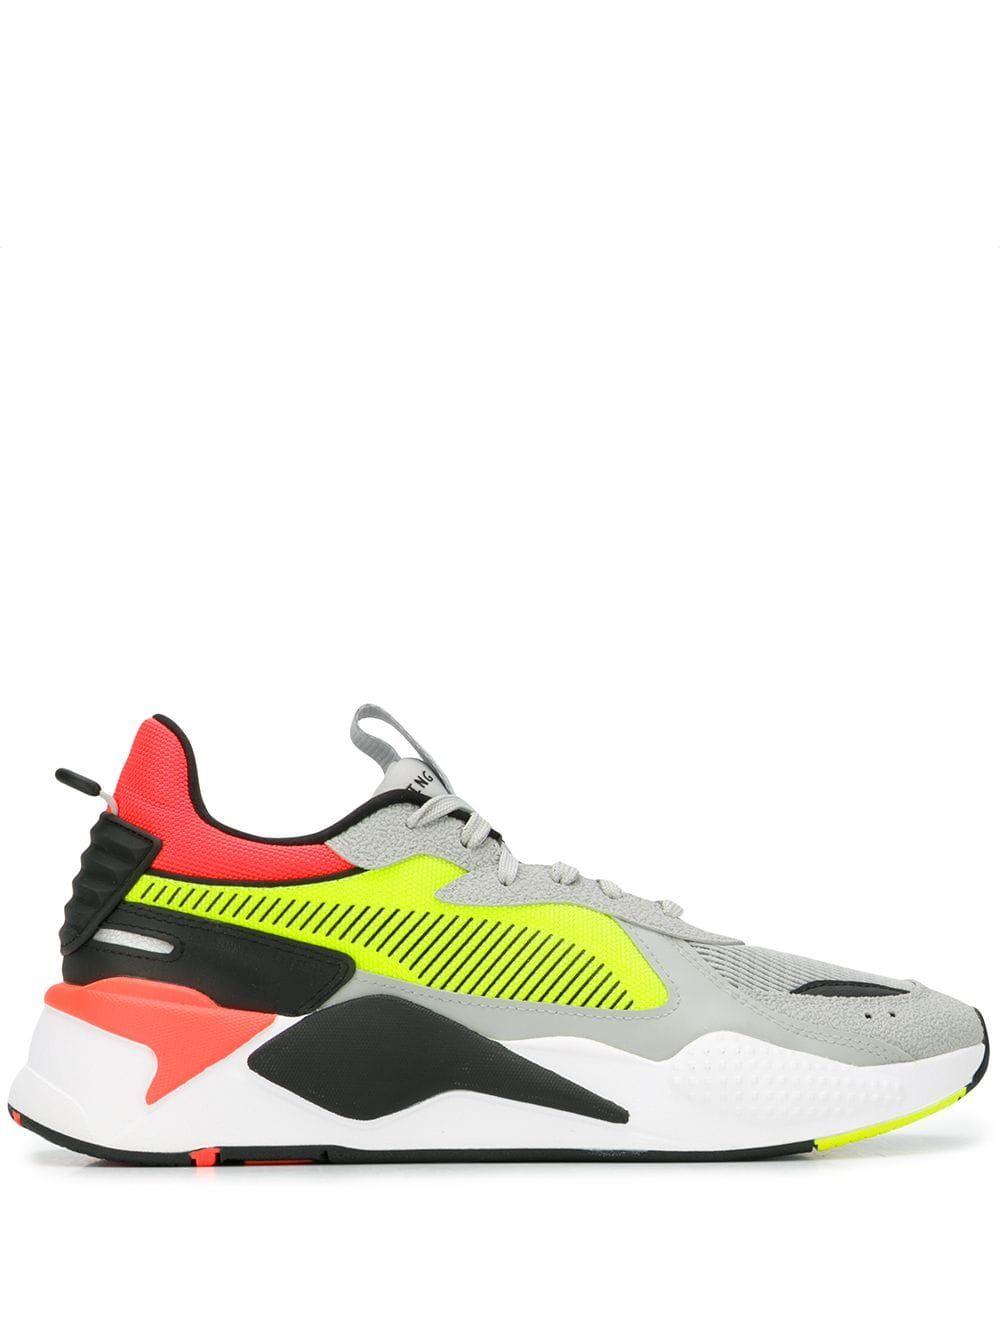 Rs-x hard drive sneakers   Yellow